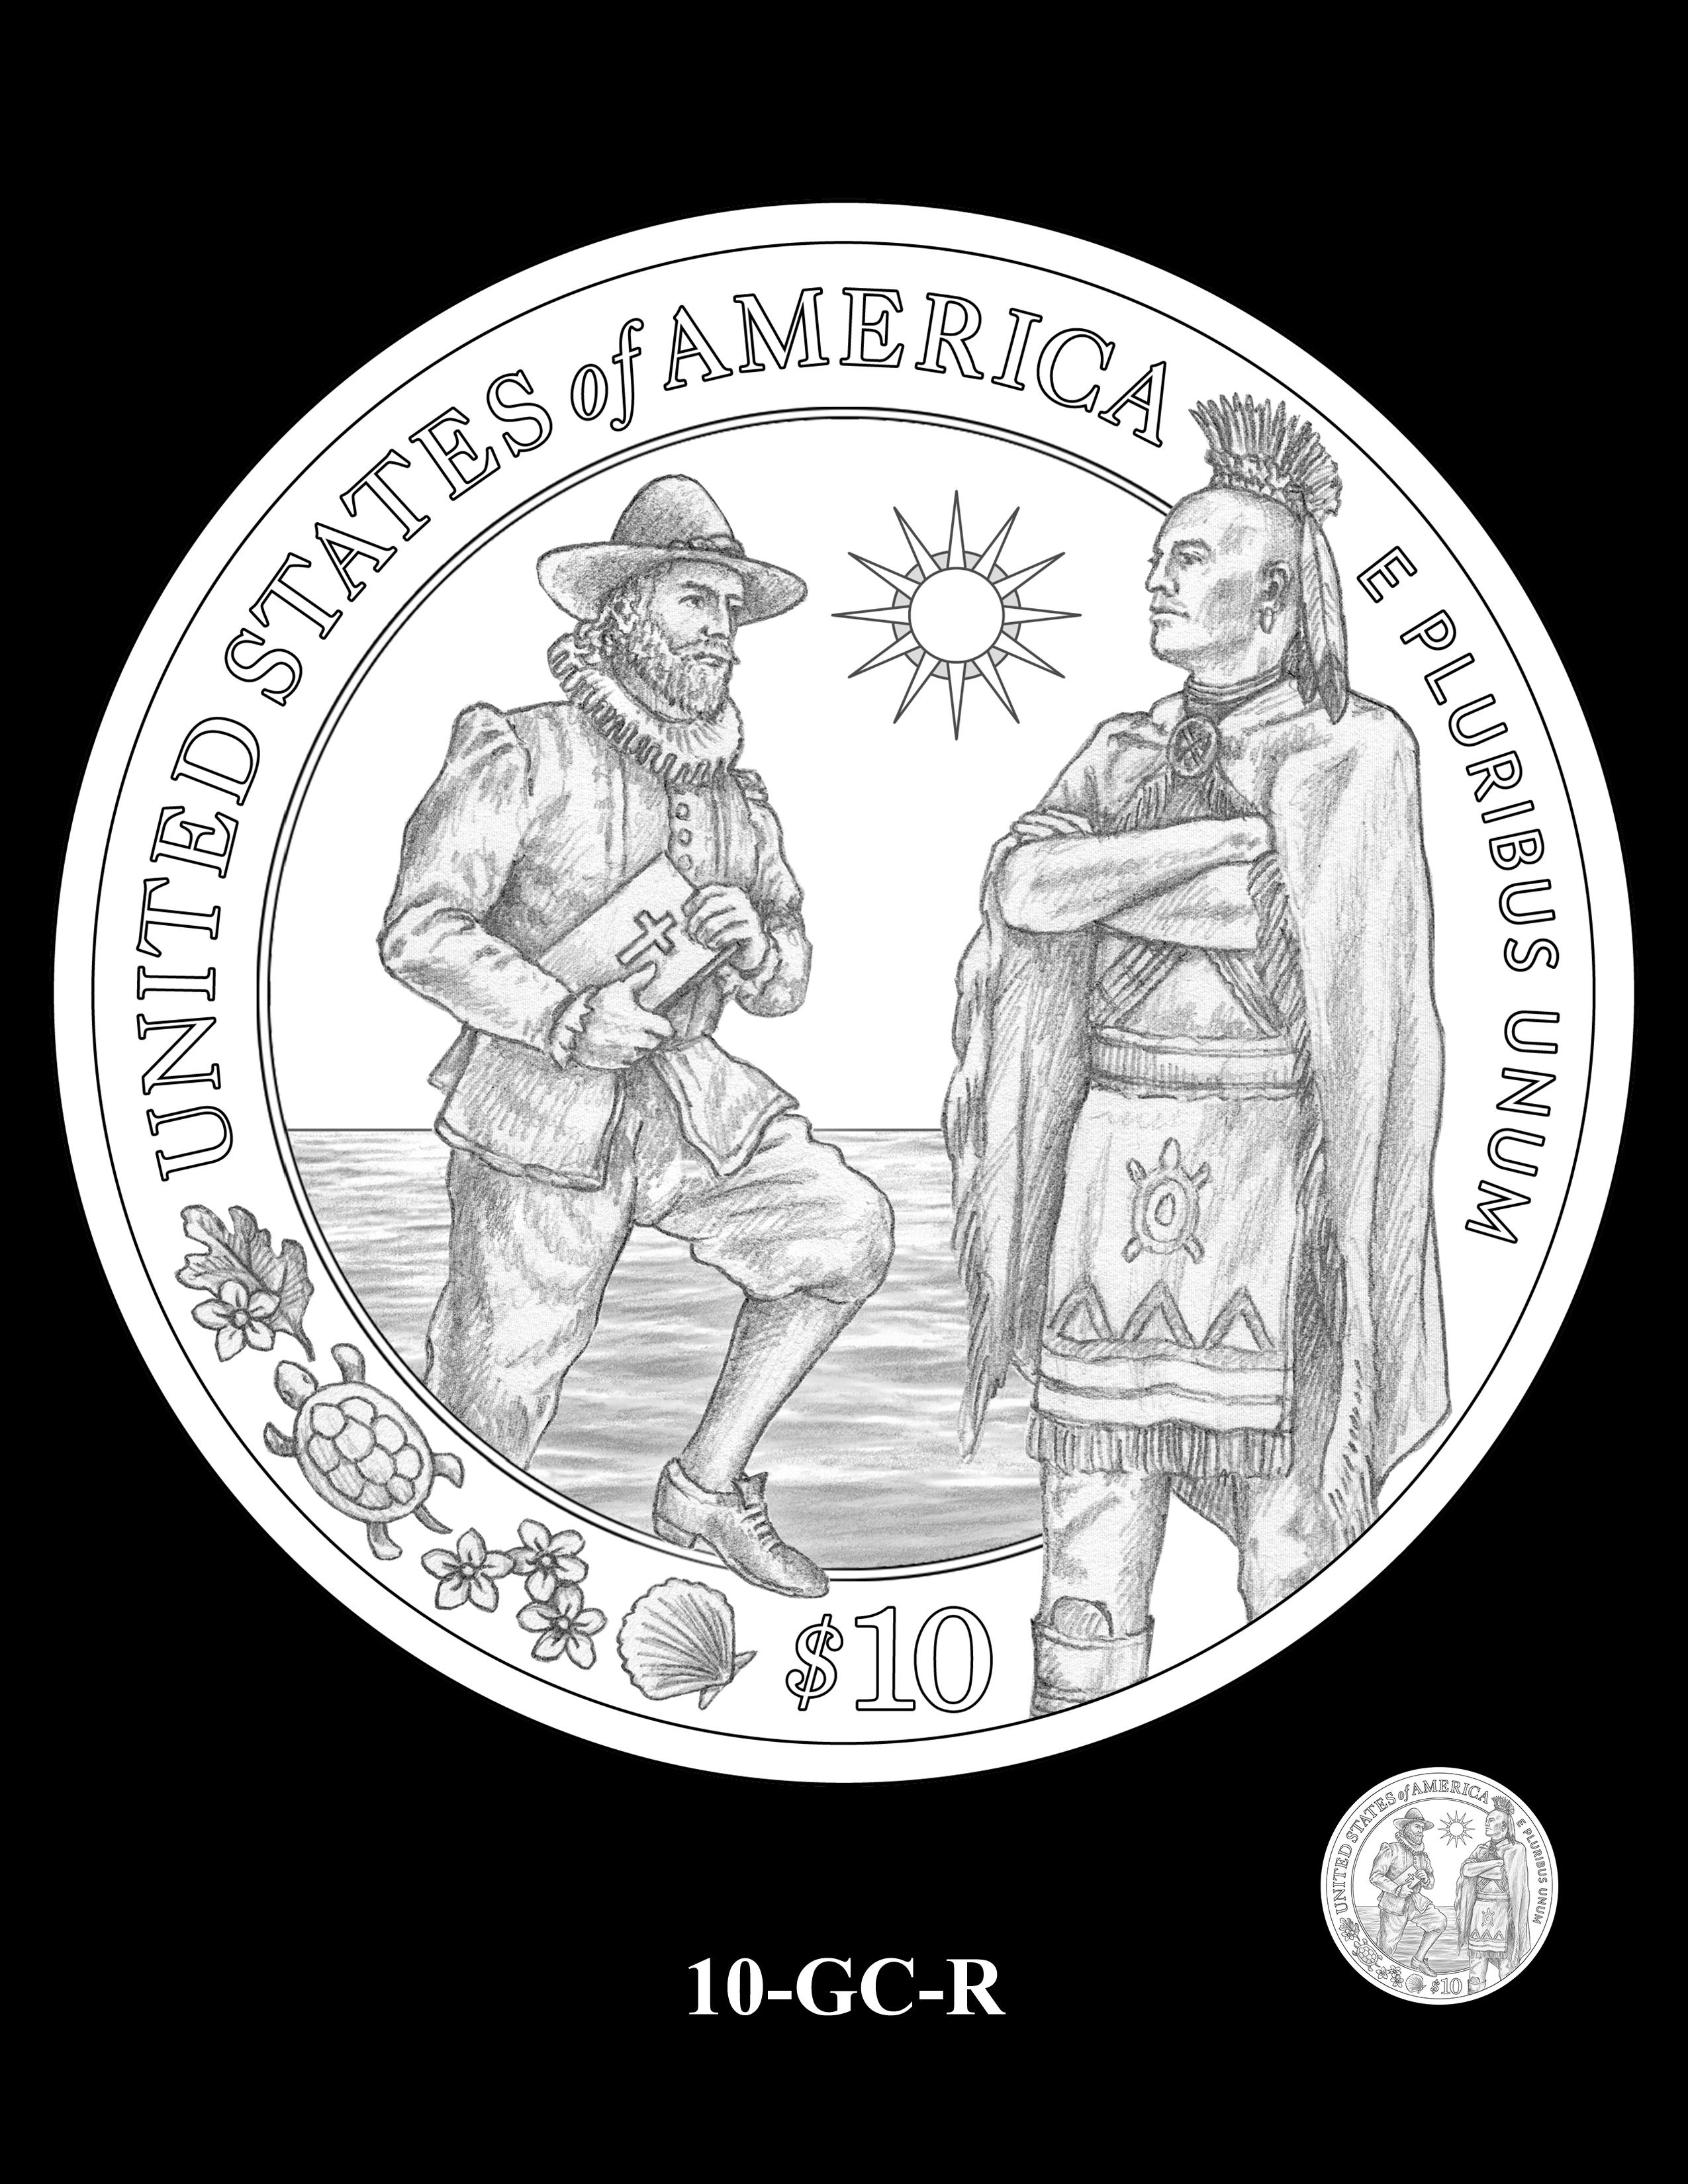 10-GC-R - 2020 Mayflower 400th Anniversary 24K Gold Coin & Silver Medal Program